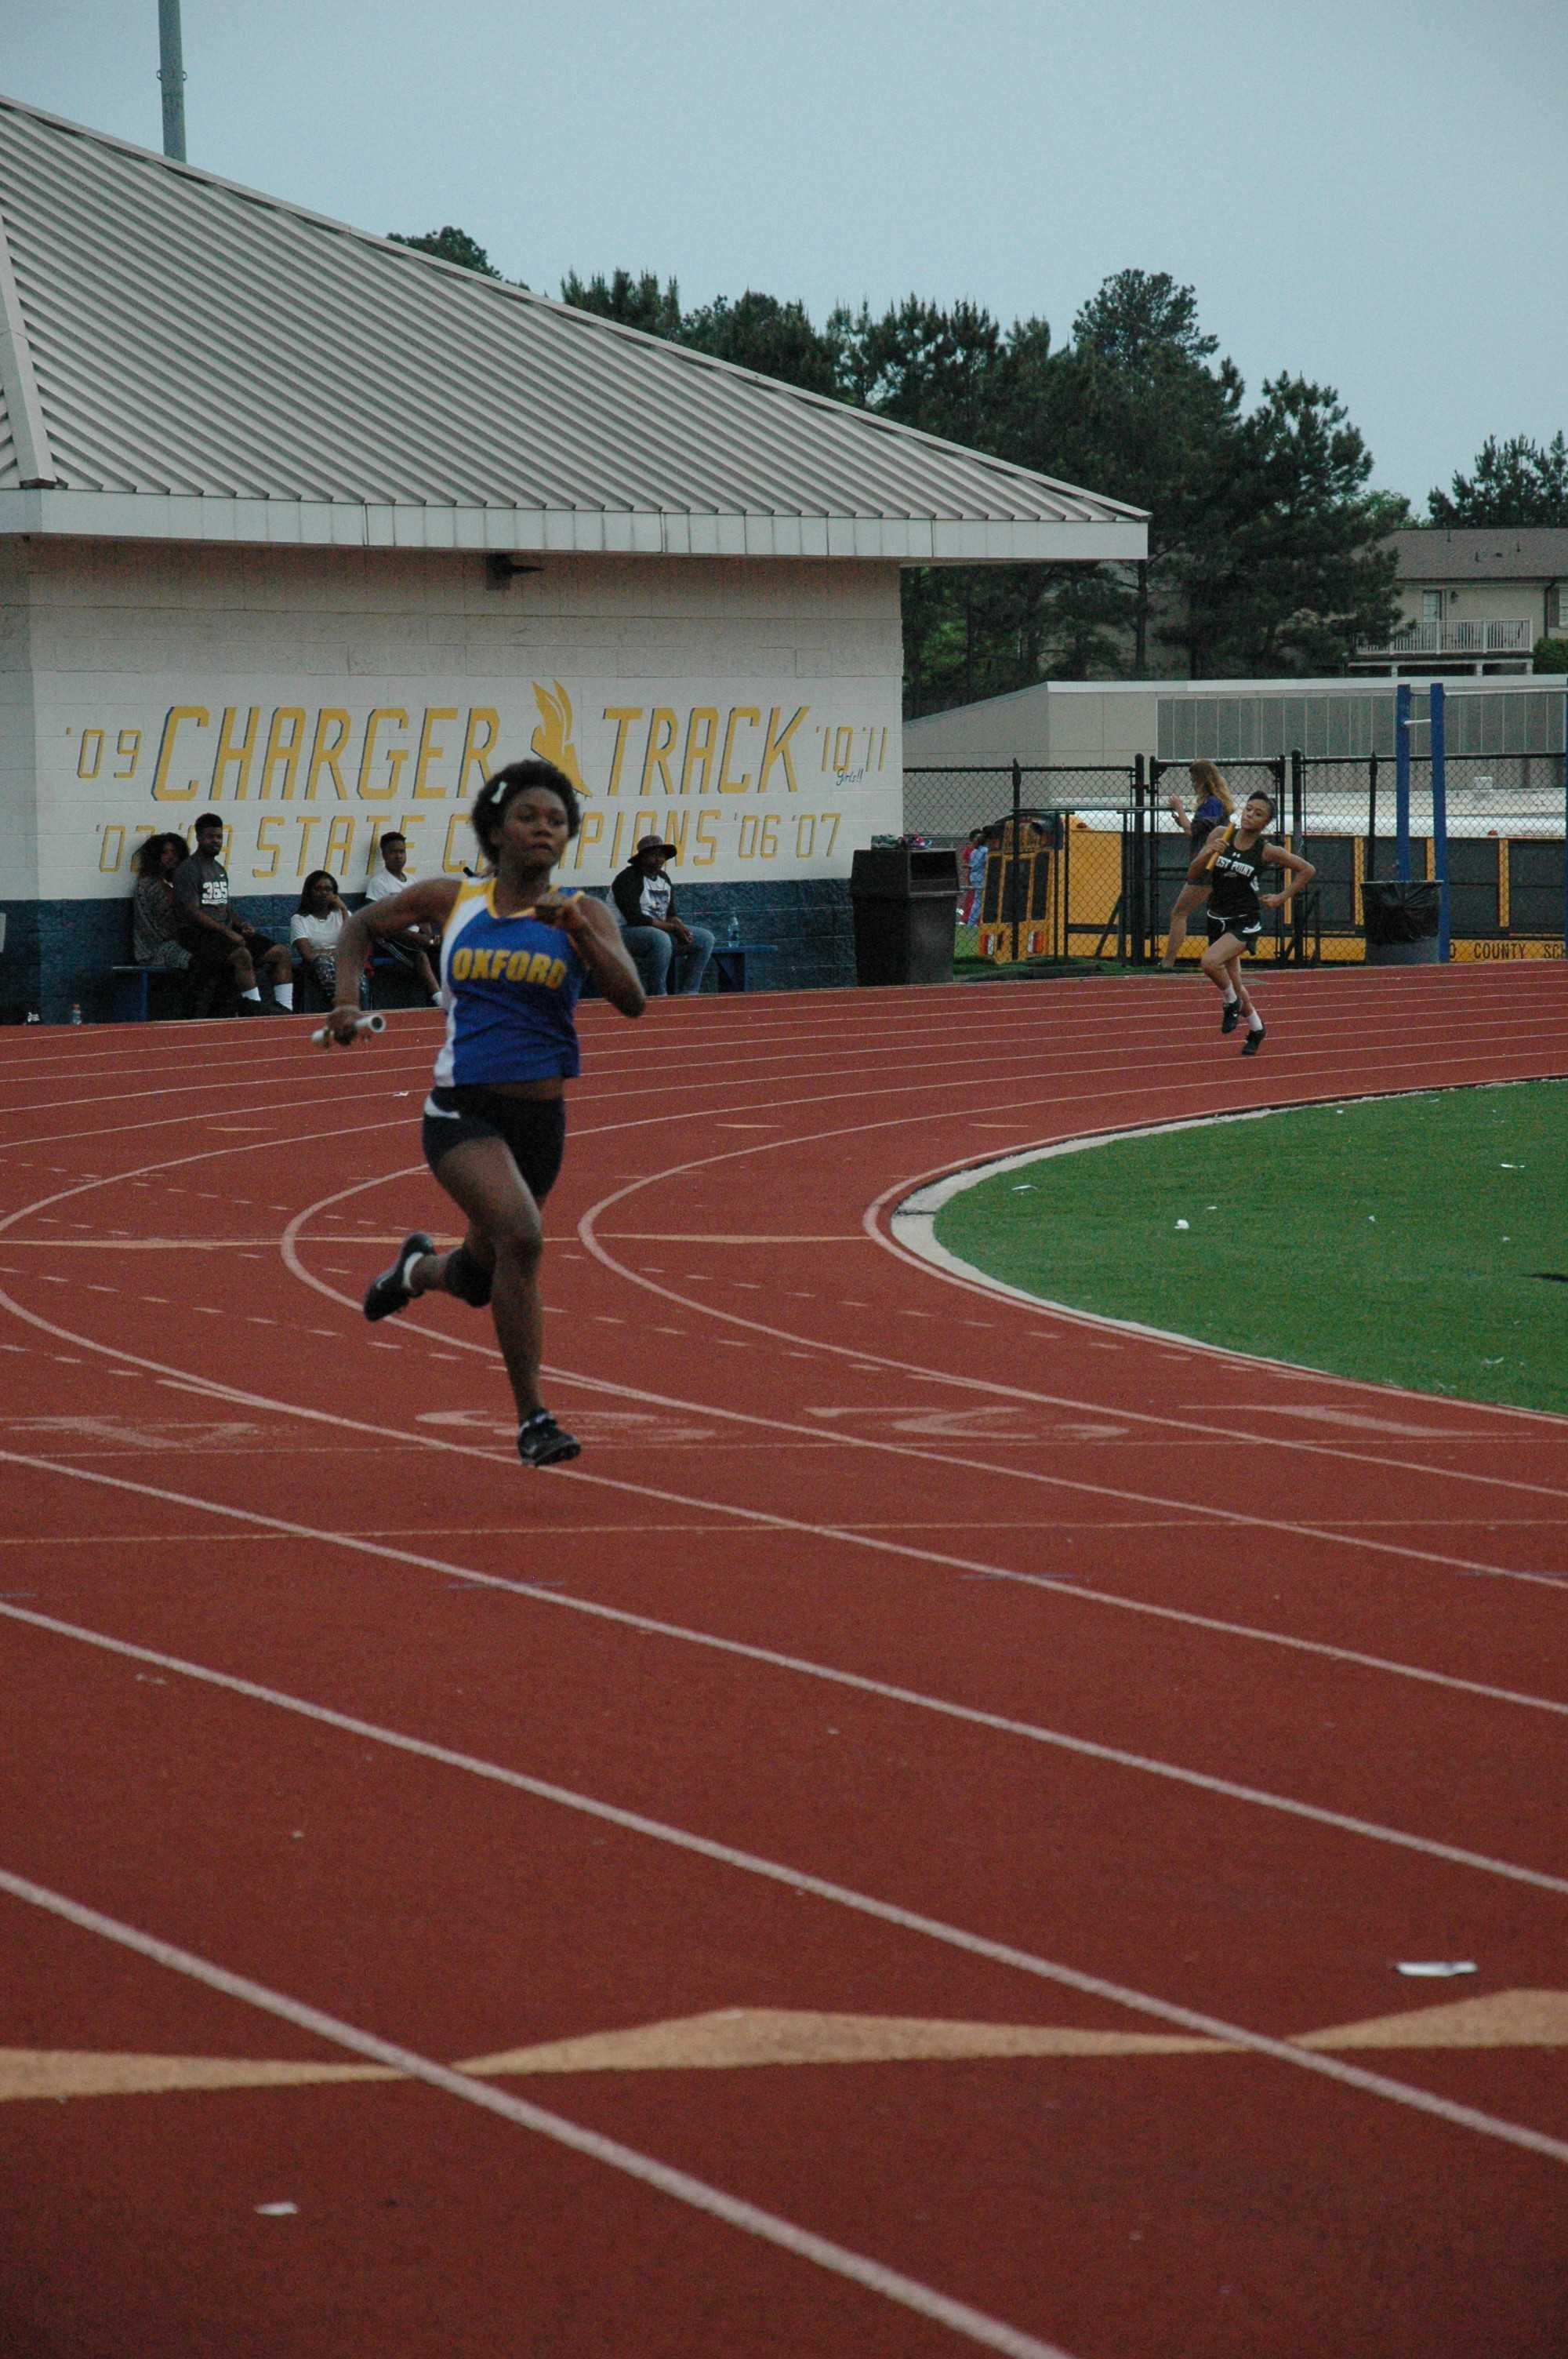 Kadijah+Ramsey+running+the+girls%27+4x200+meter+relay.